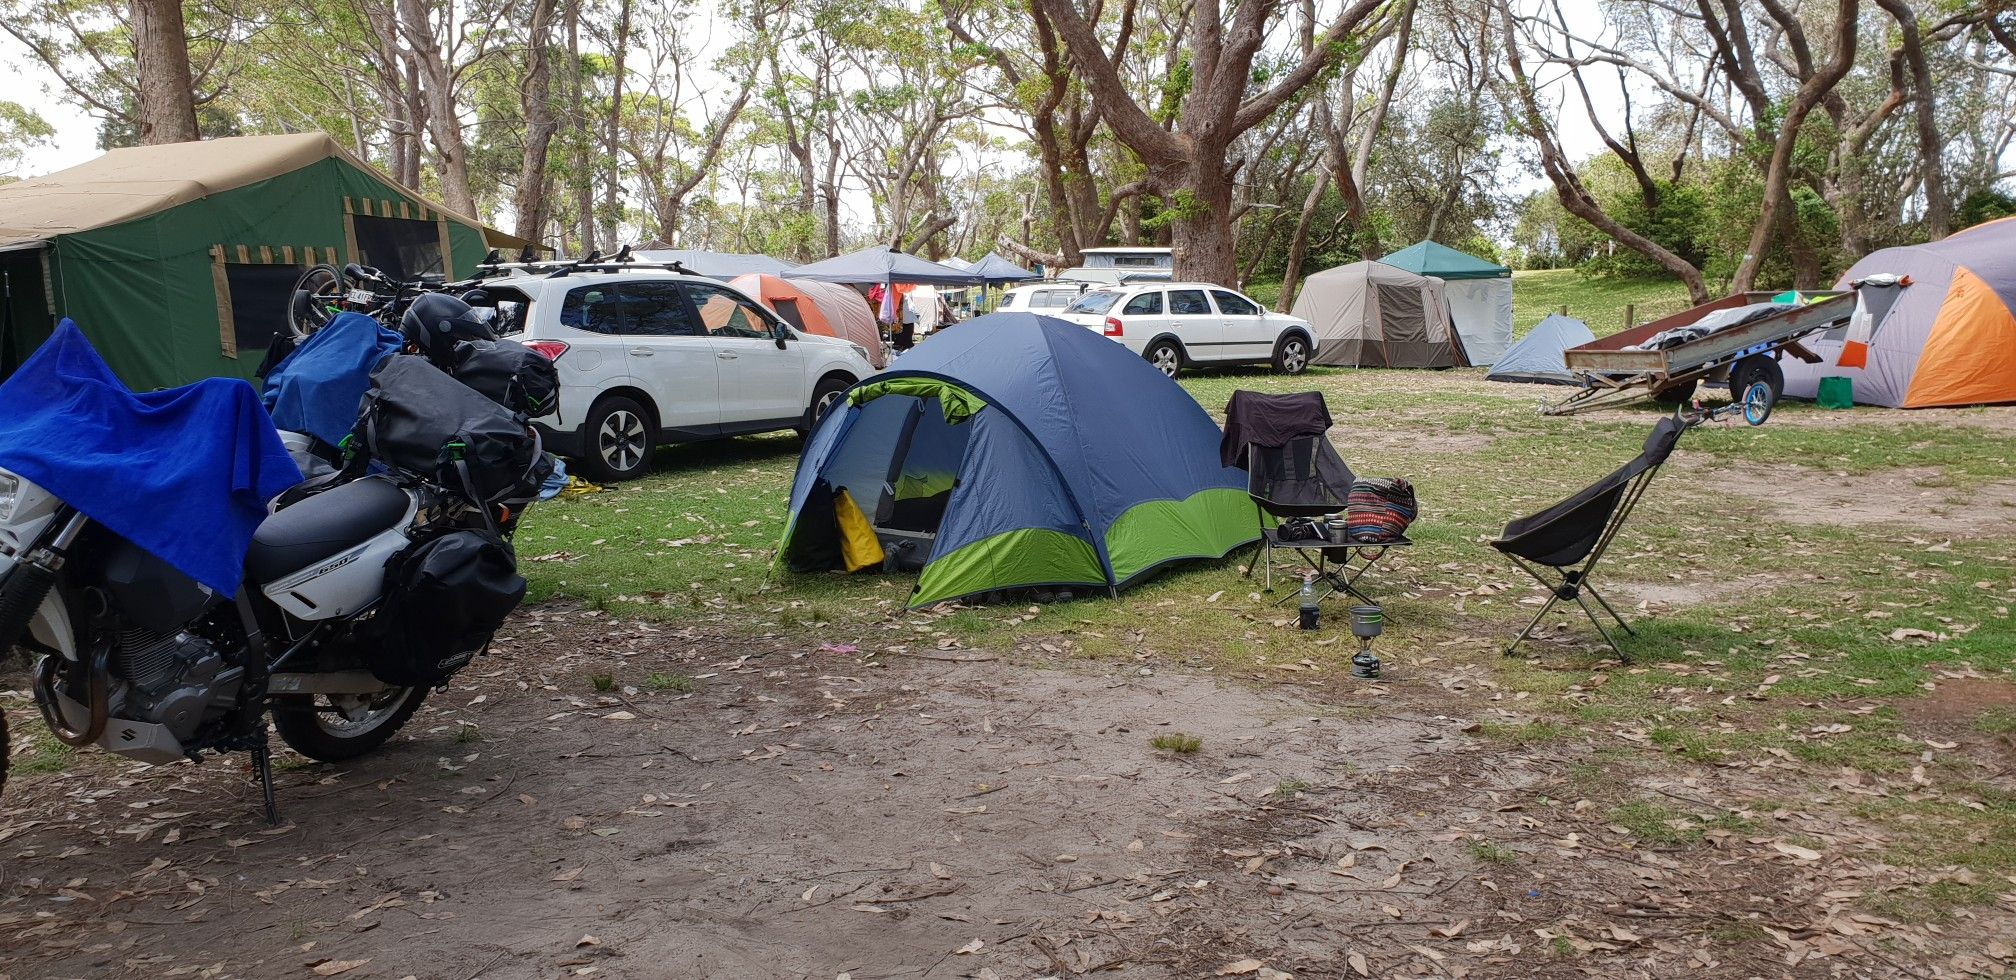 Camping at Kioloa, beautiful spot on south coast NSW. Walk ...